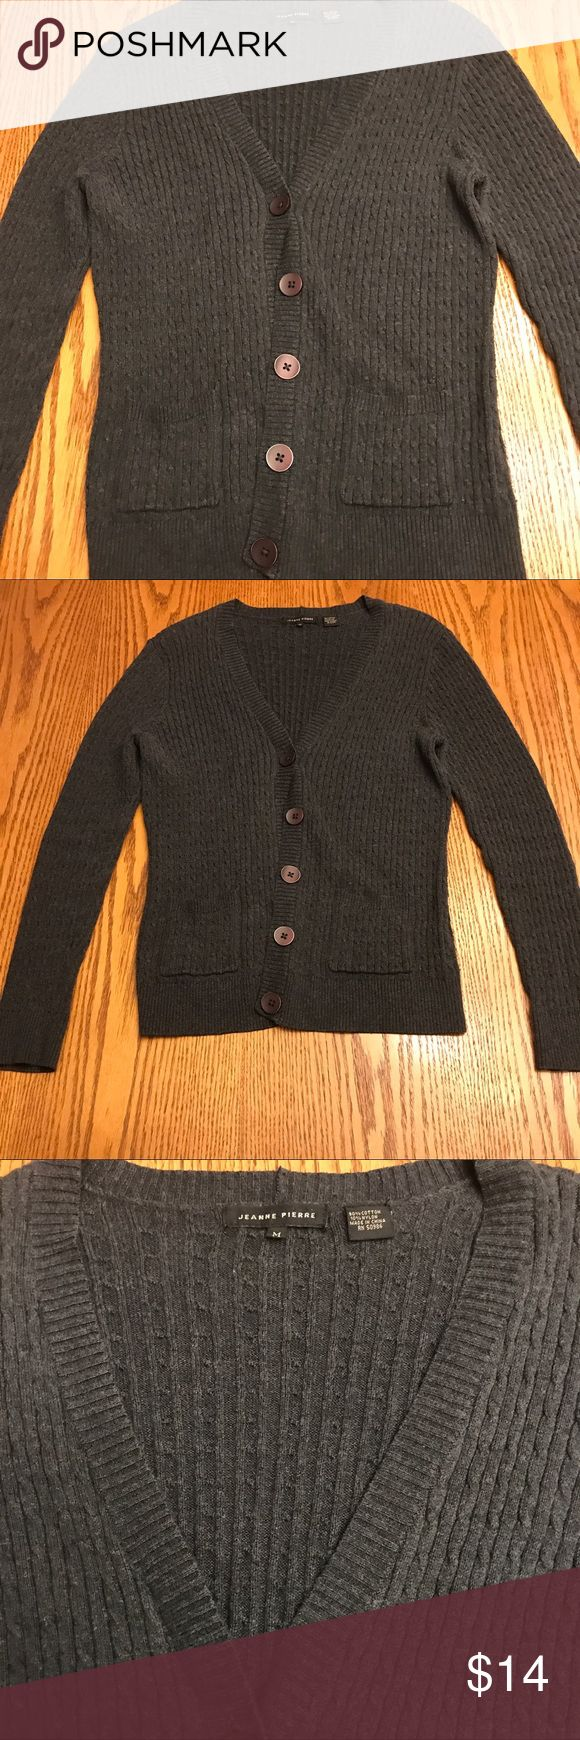 Jeanne Pierre Sweater Cardigan Grey Button Down Soft and comfy grey cardigan Jeanne Pierre Sweaters Cardigans